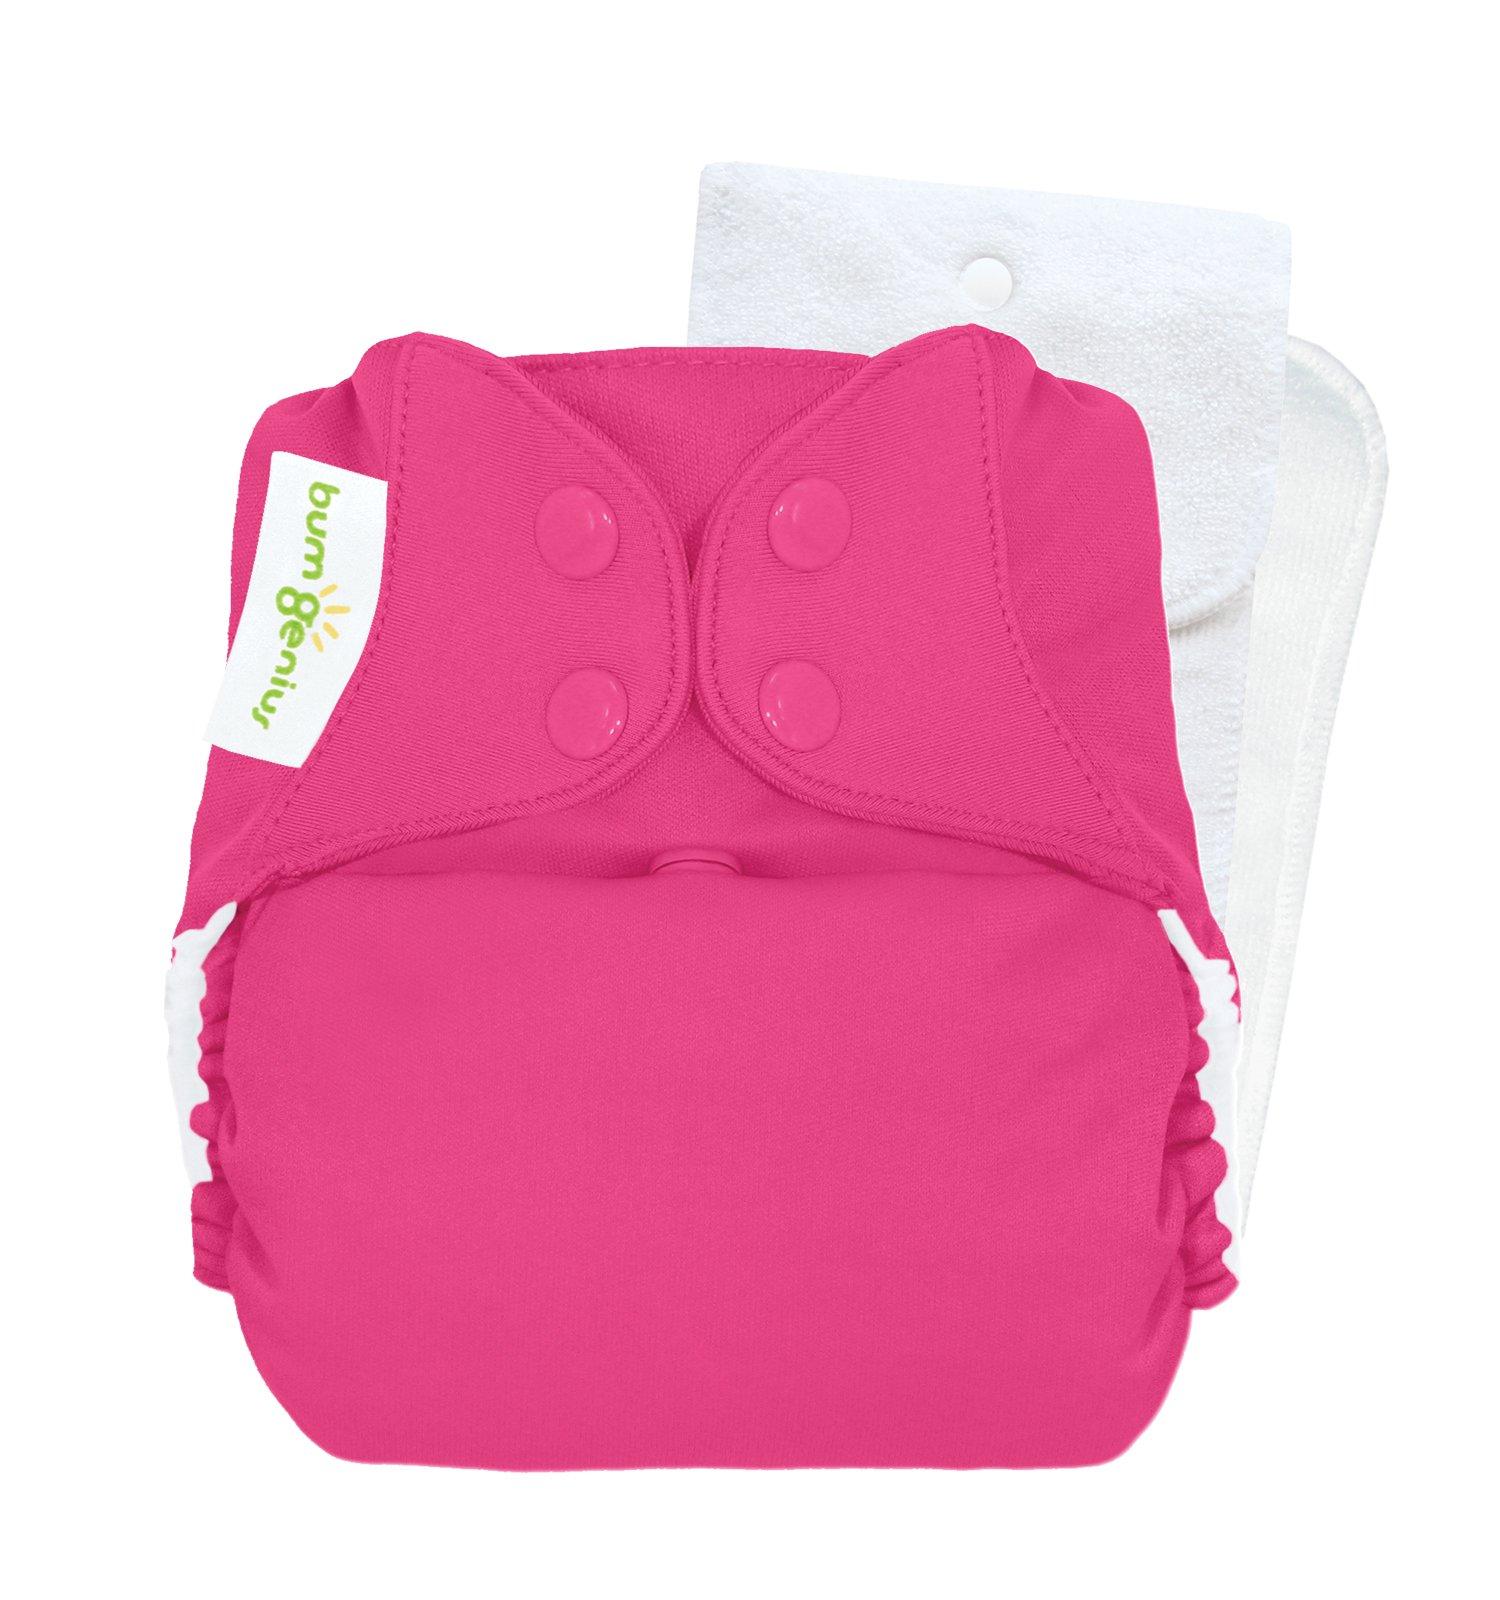 BumGenius 5.0 Pocket Cloth Diaper - Countess - One Size - Snap